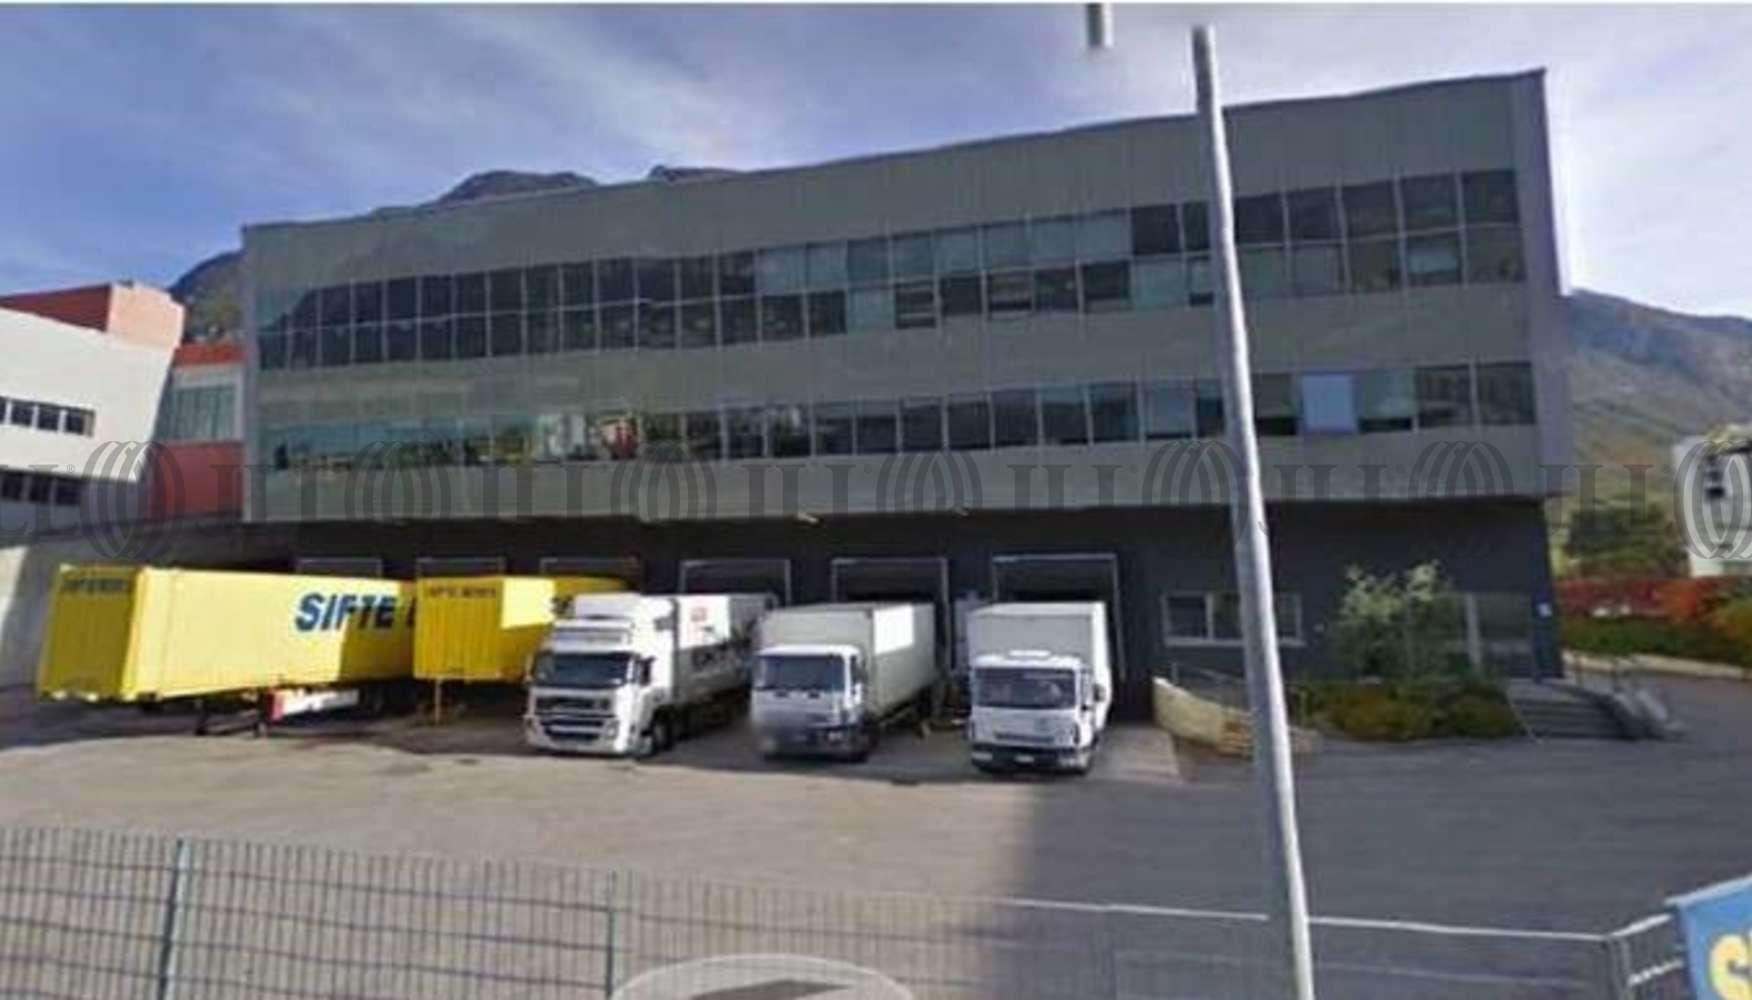 Magazzini industriali e logistici Egna, 39044 - Immobile logistico Bolzano